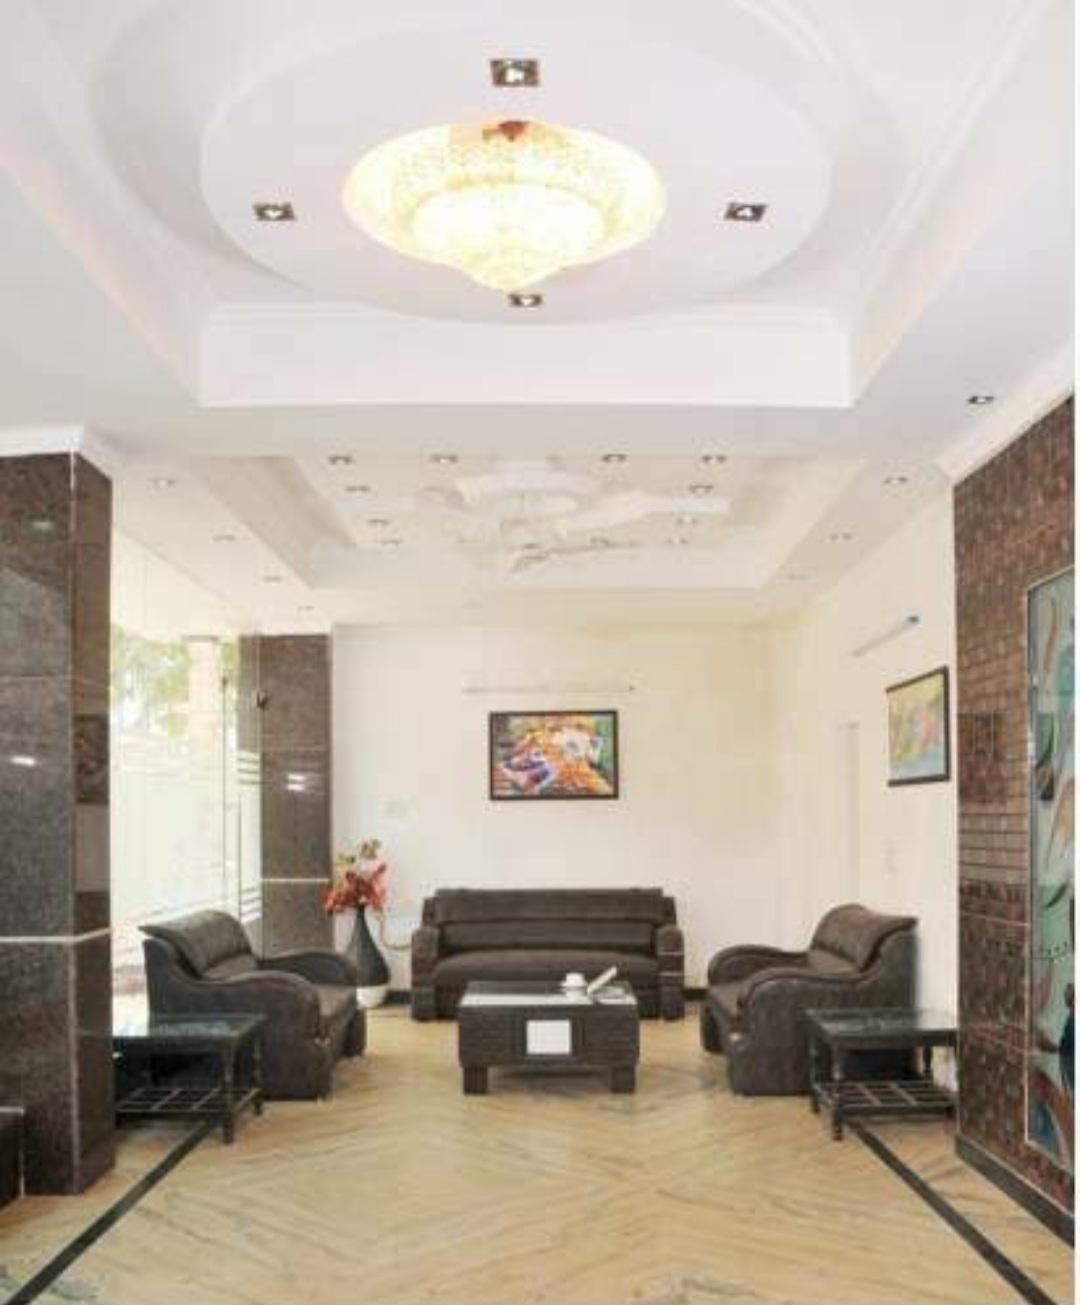 38 bedroom hotel for sale in paharganj, Delhi